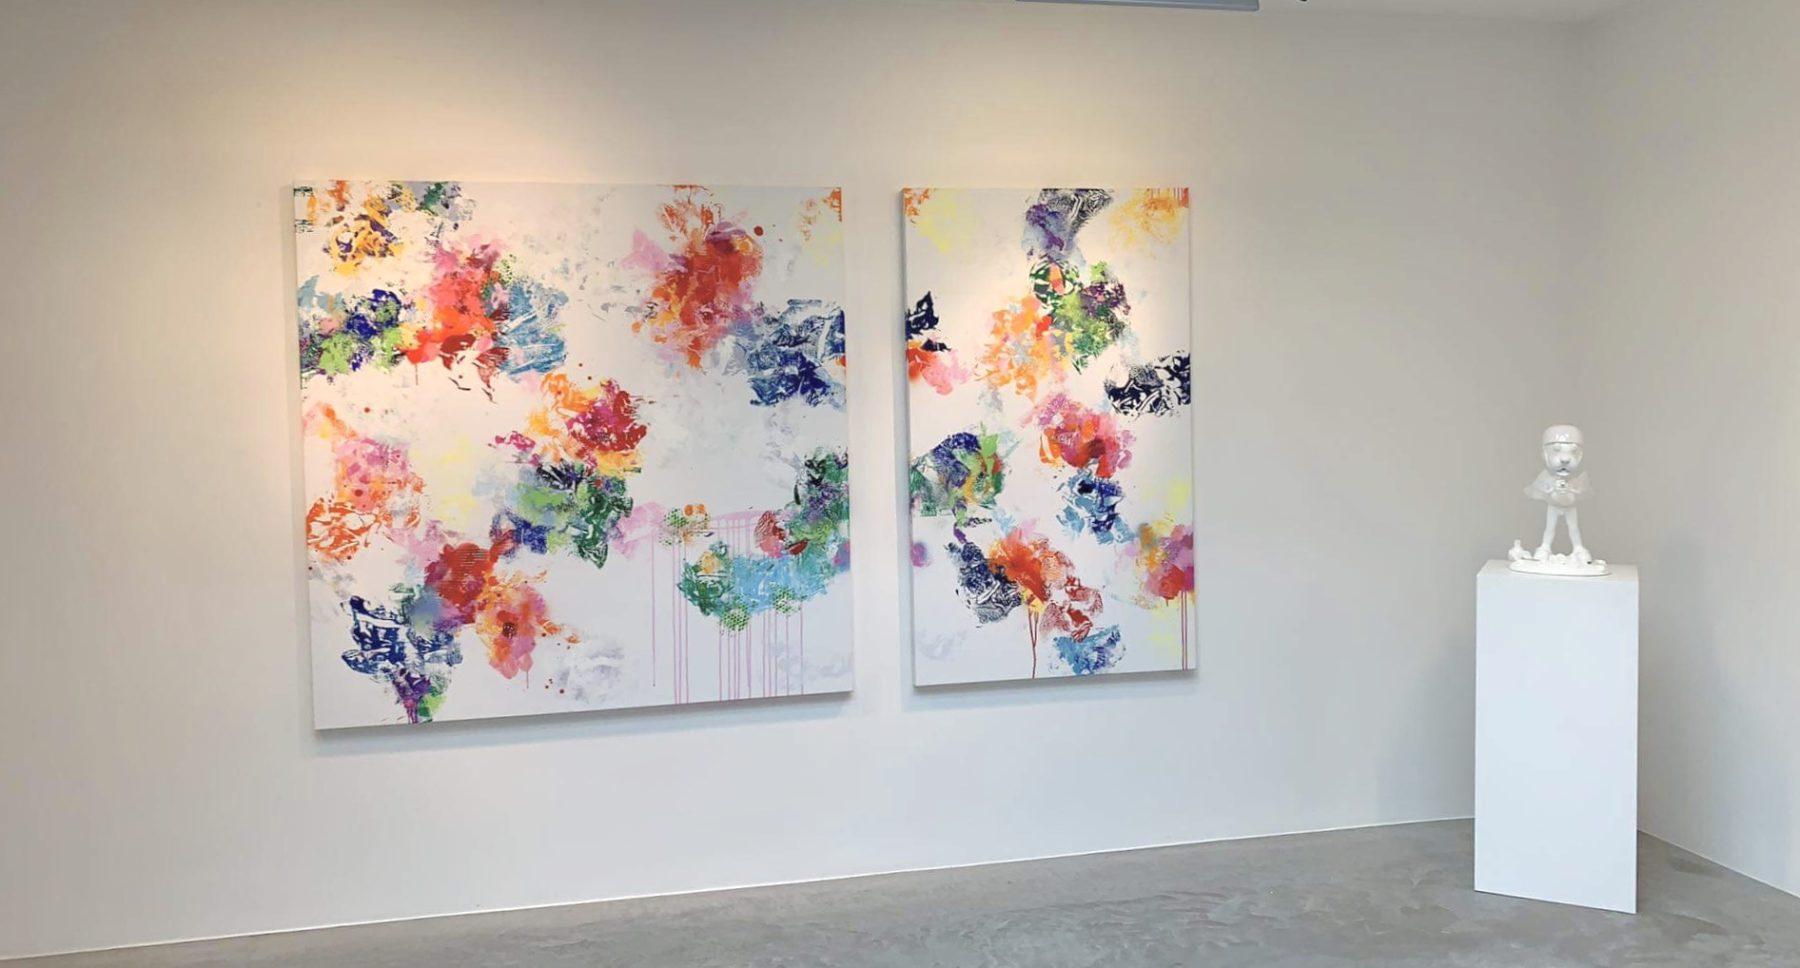 alexandra de grave rasson art gallery